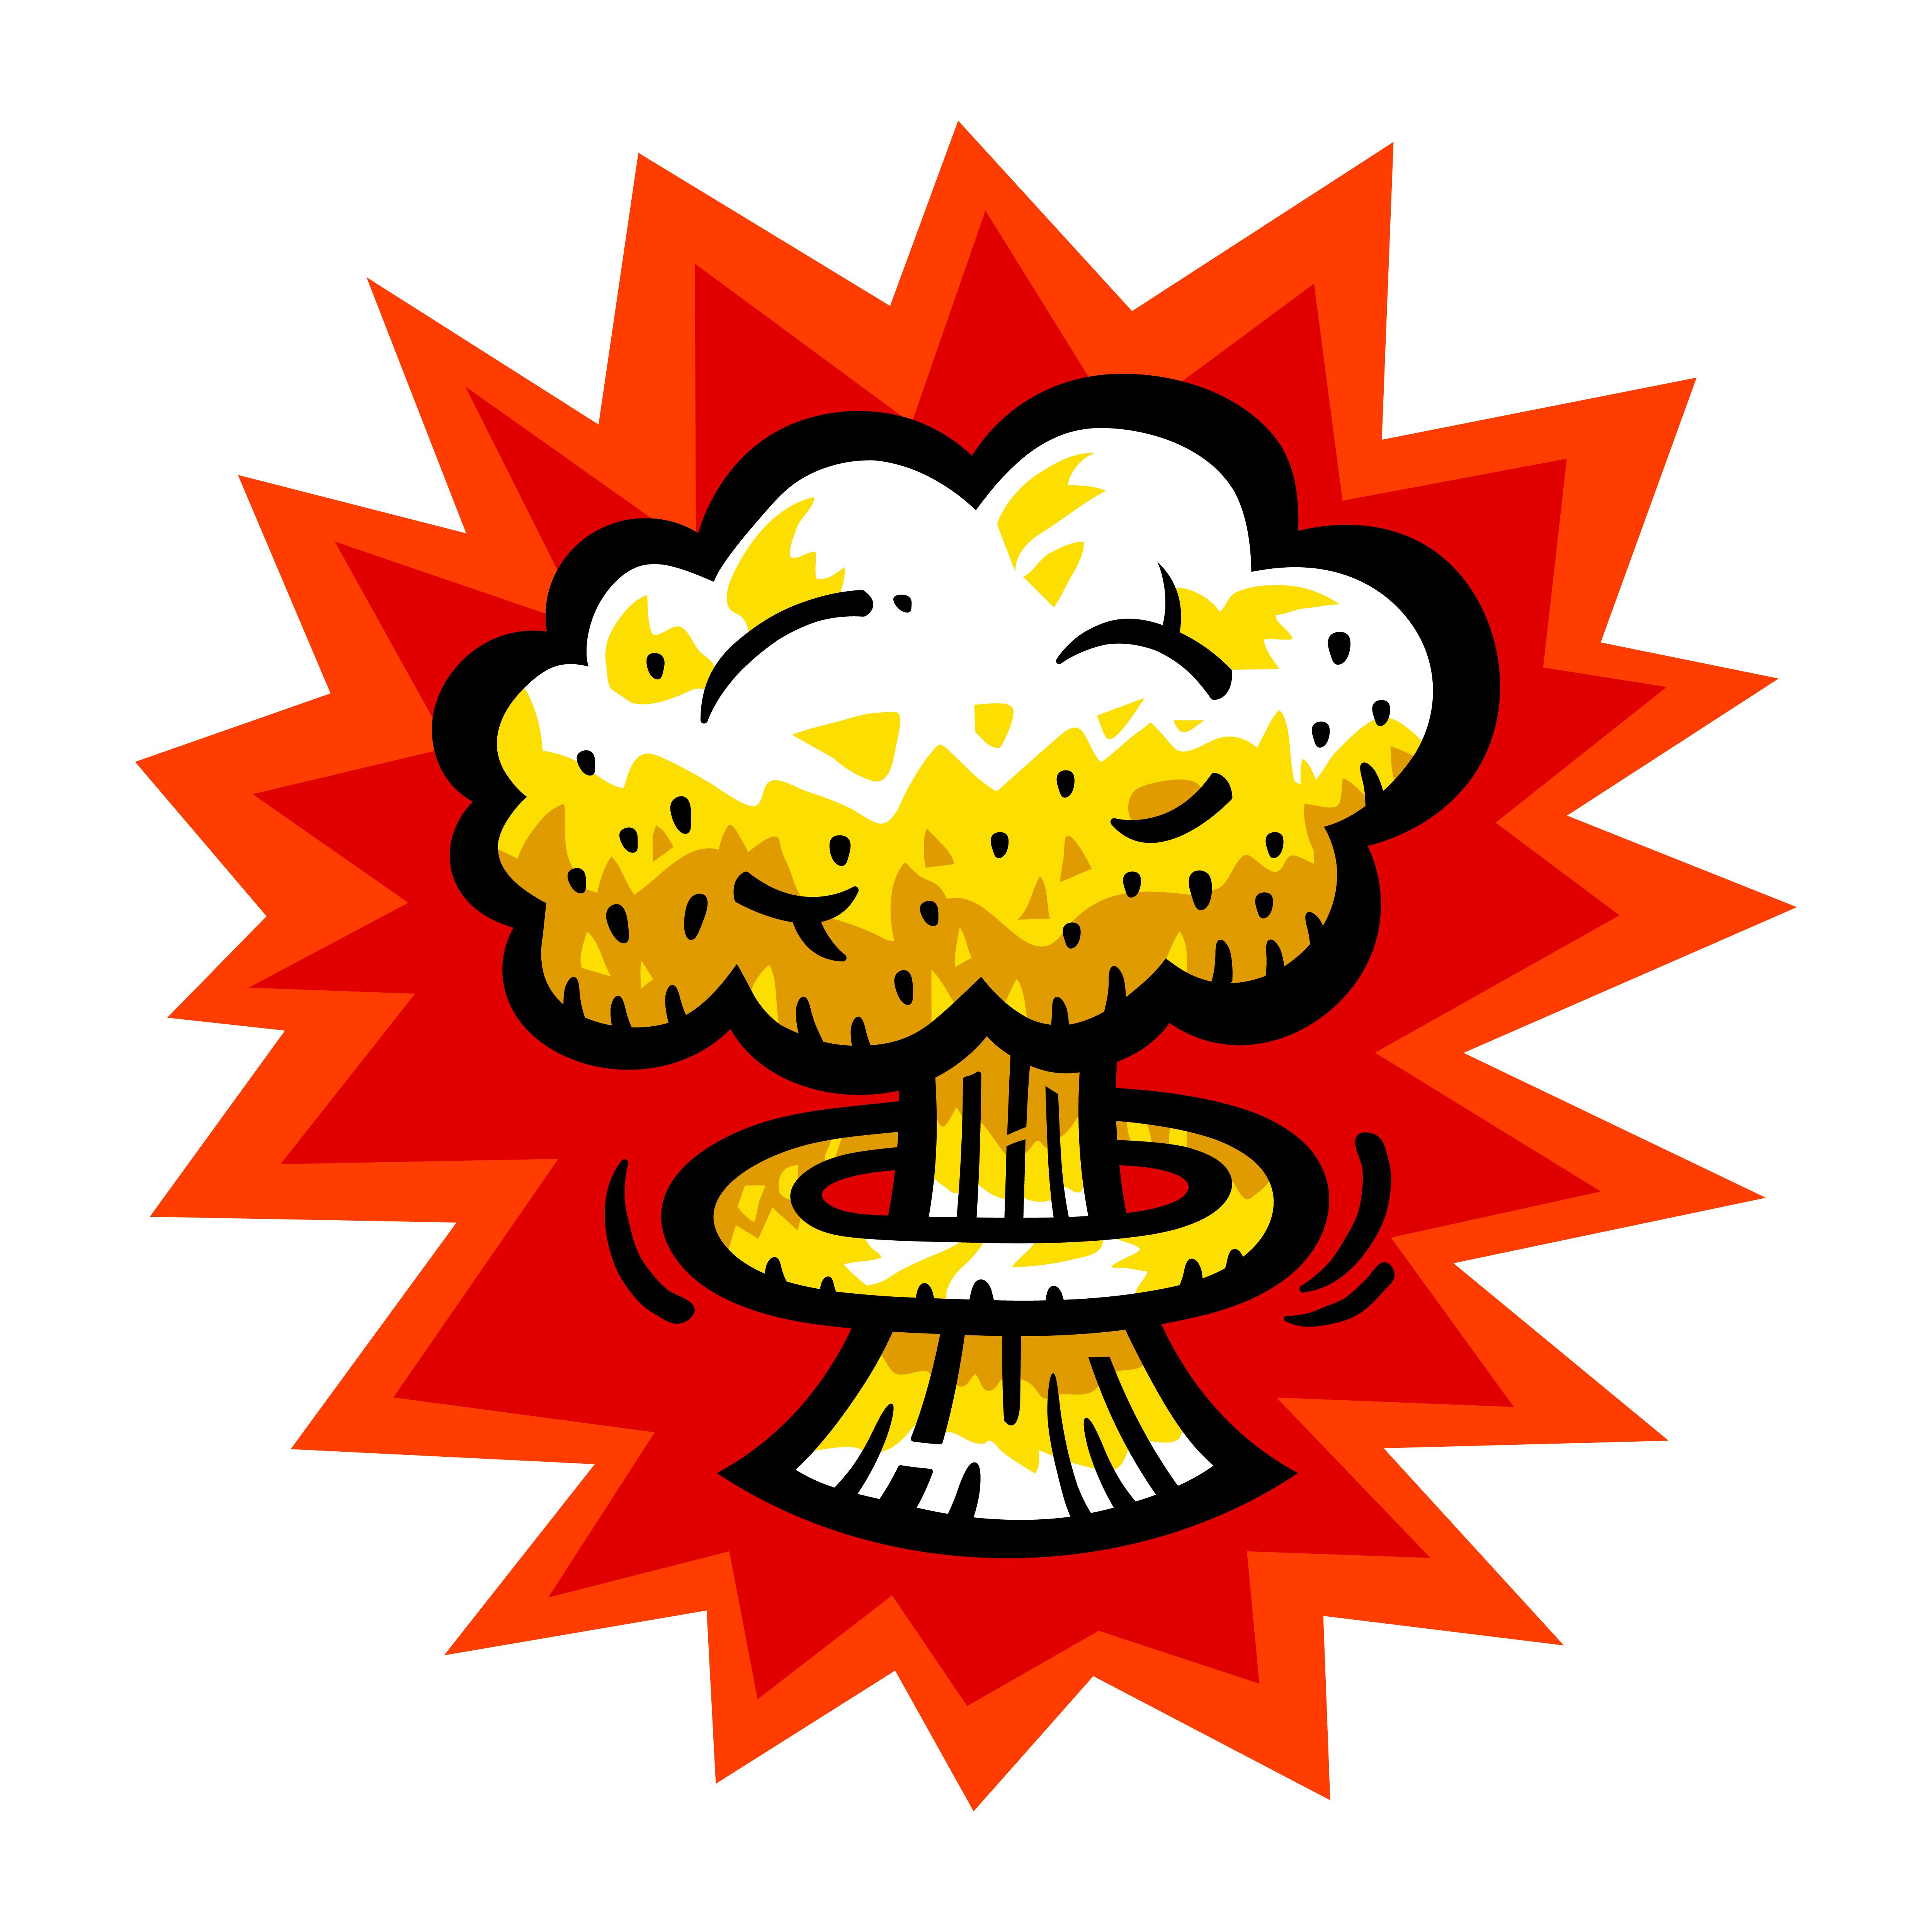 mushroom cloud atomic nuclear bomb explosion fallout vector icon download free vectors clipart graphics vector art vecteezy